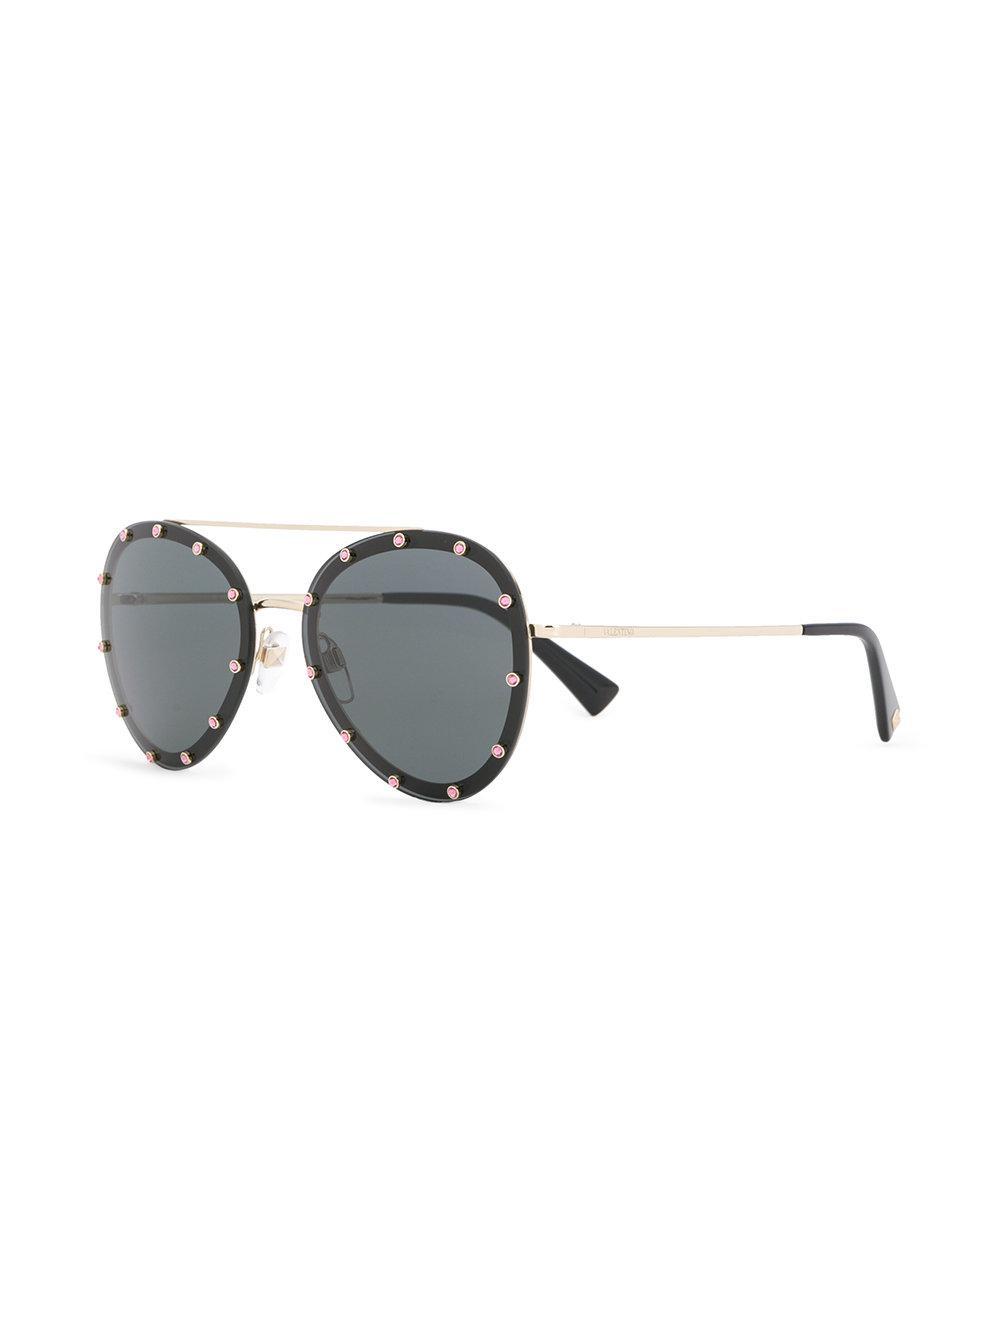 2d610bee24 Lyst - Valentino Eyewear Valentino Garavani Rockstud Glamtech ...